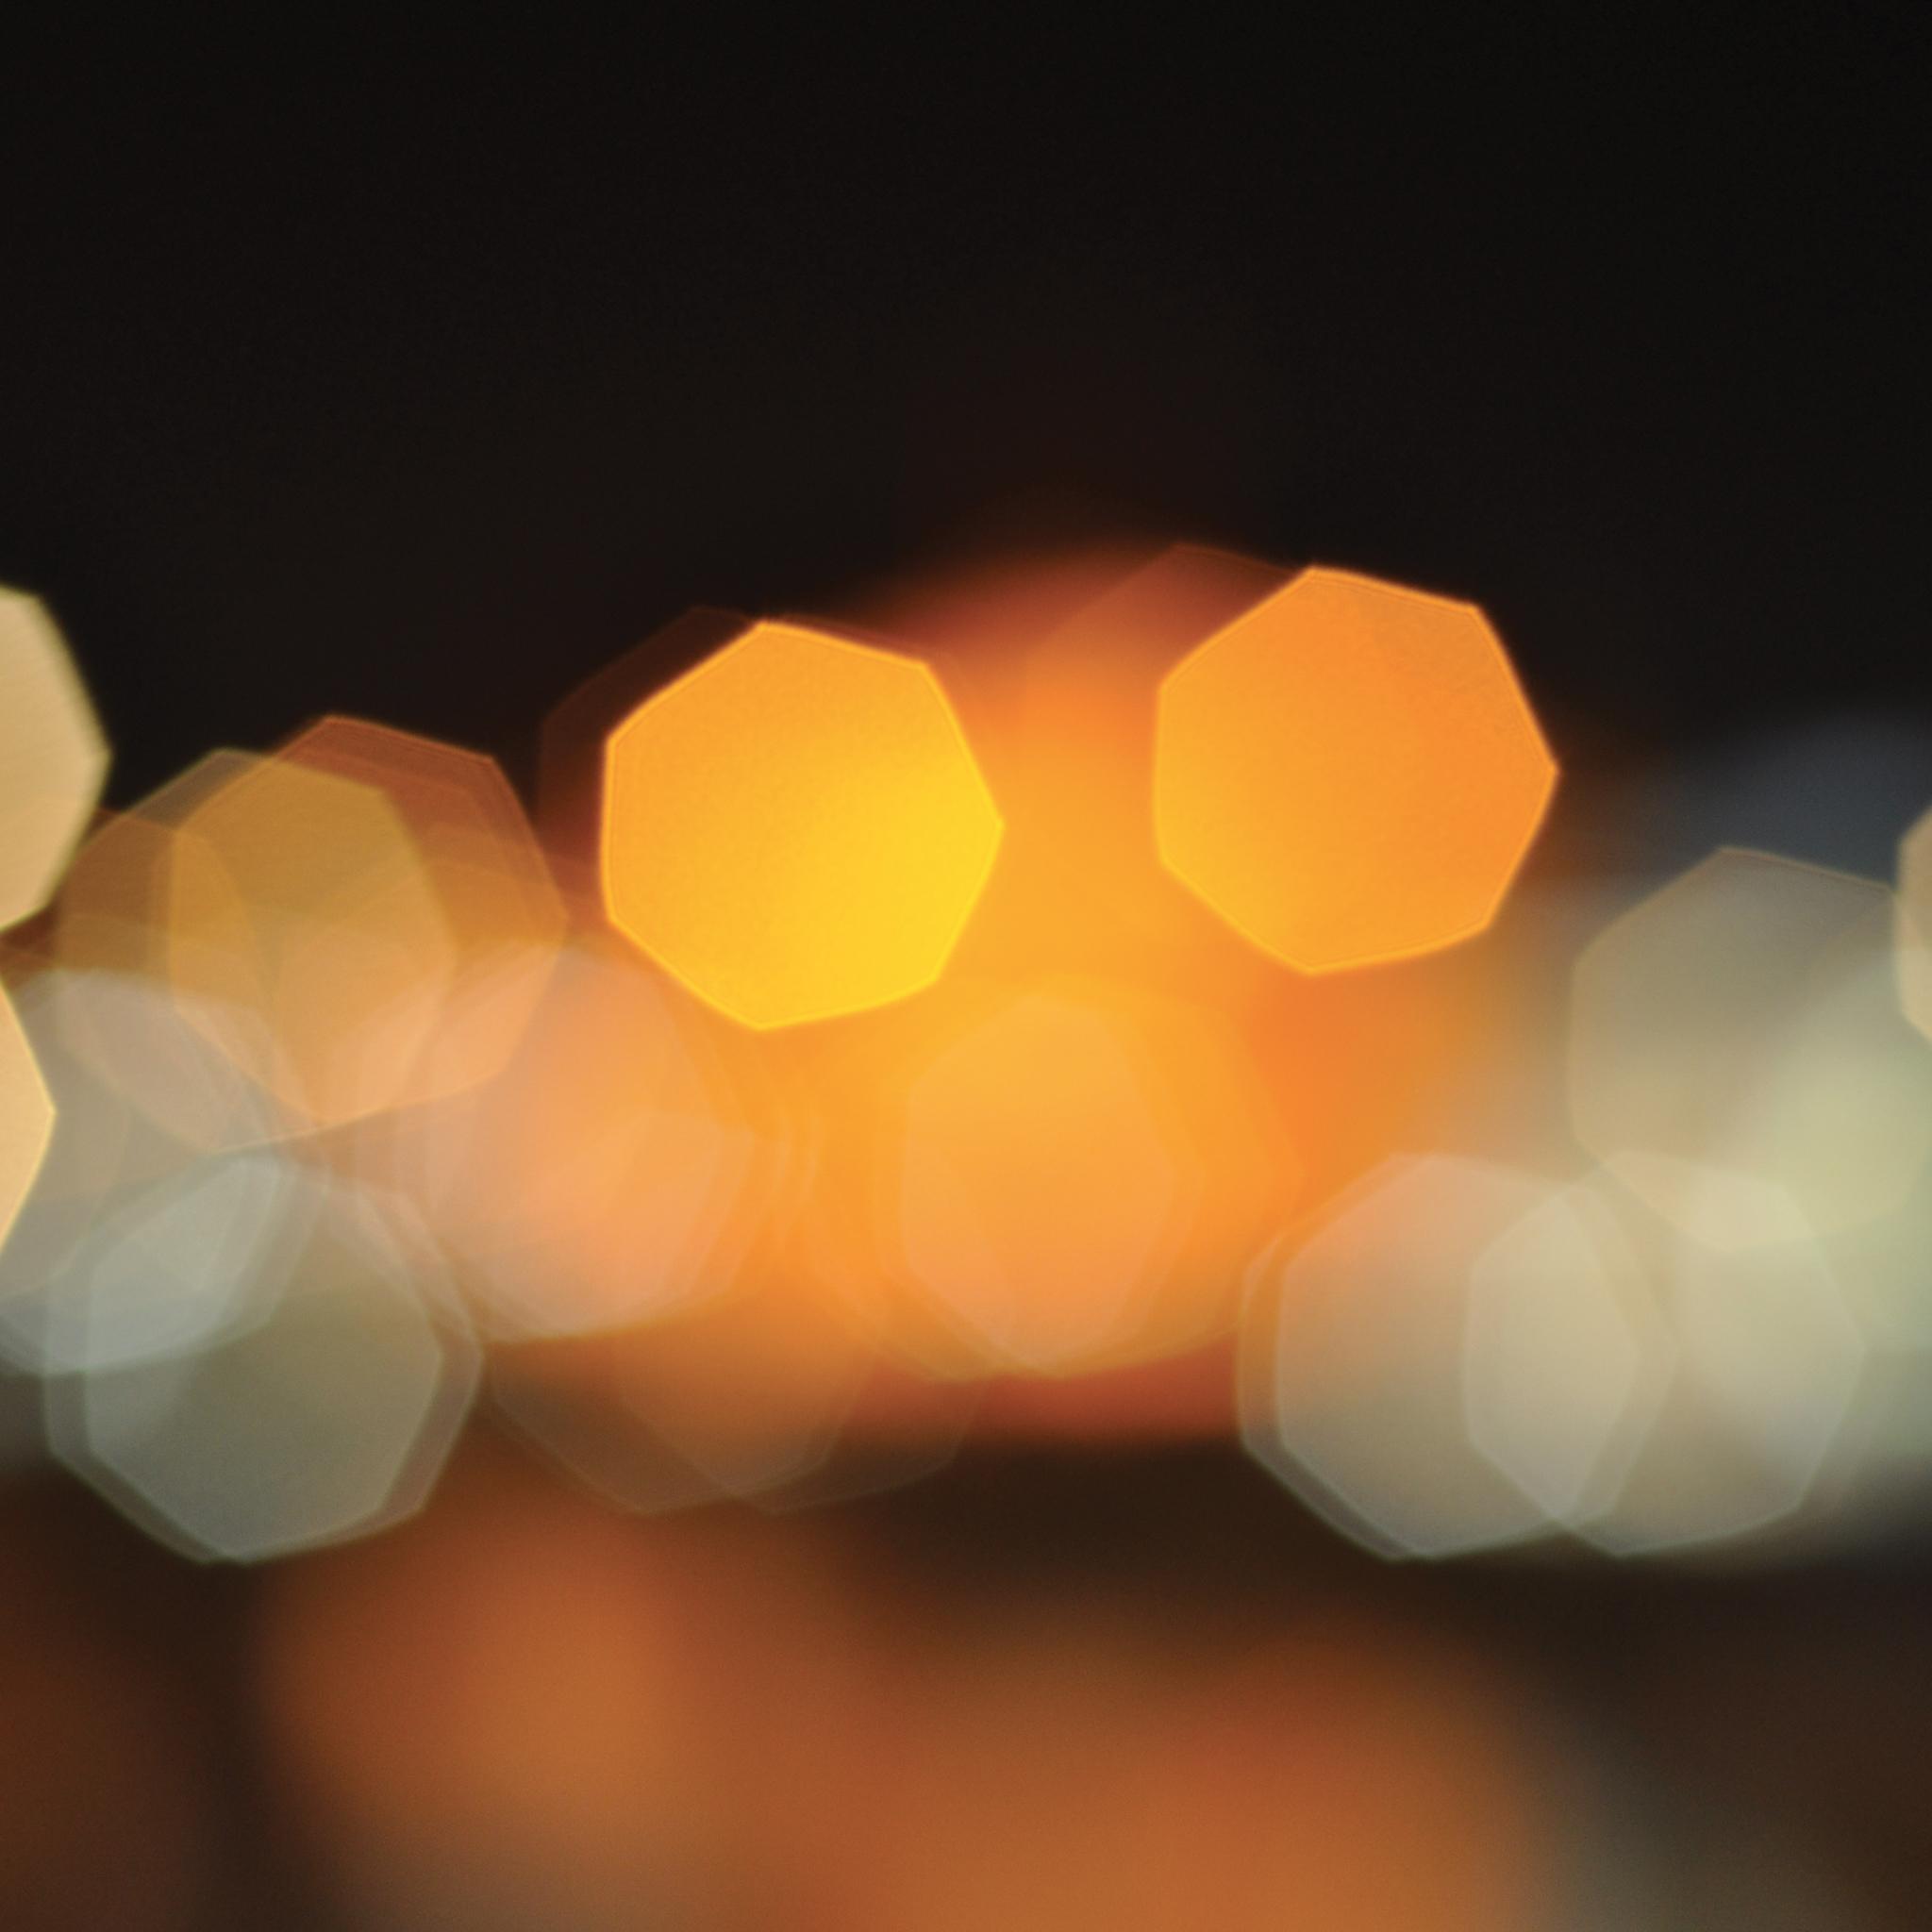 City Light 3Wallpapers iPad City Light   iPad